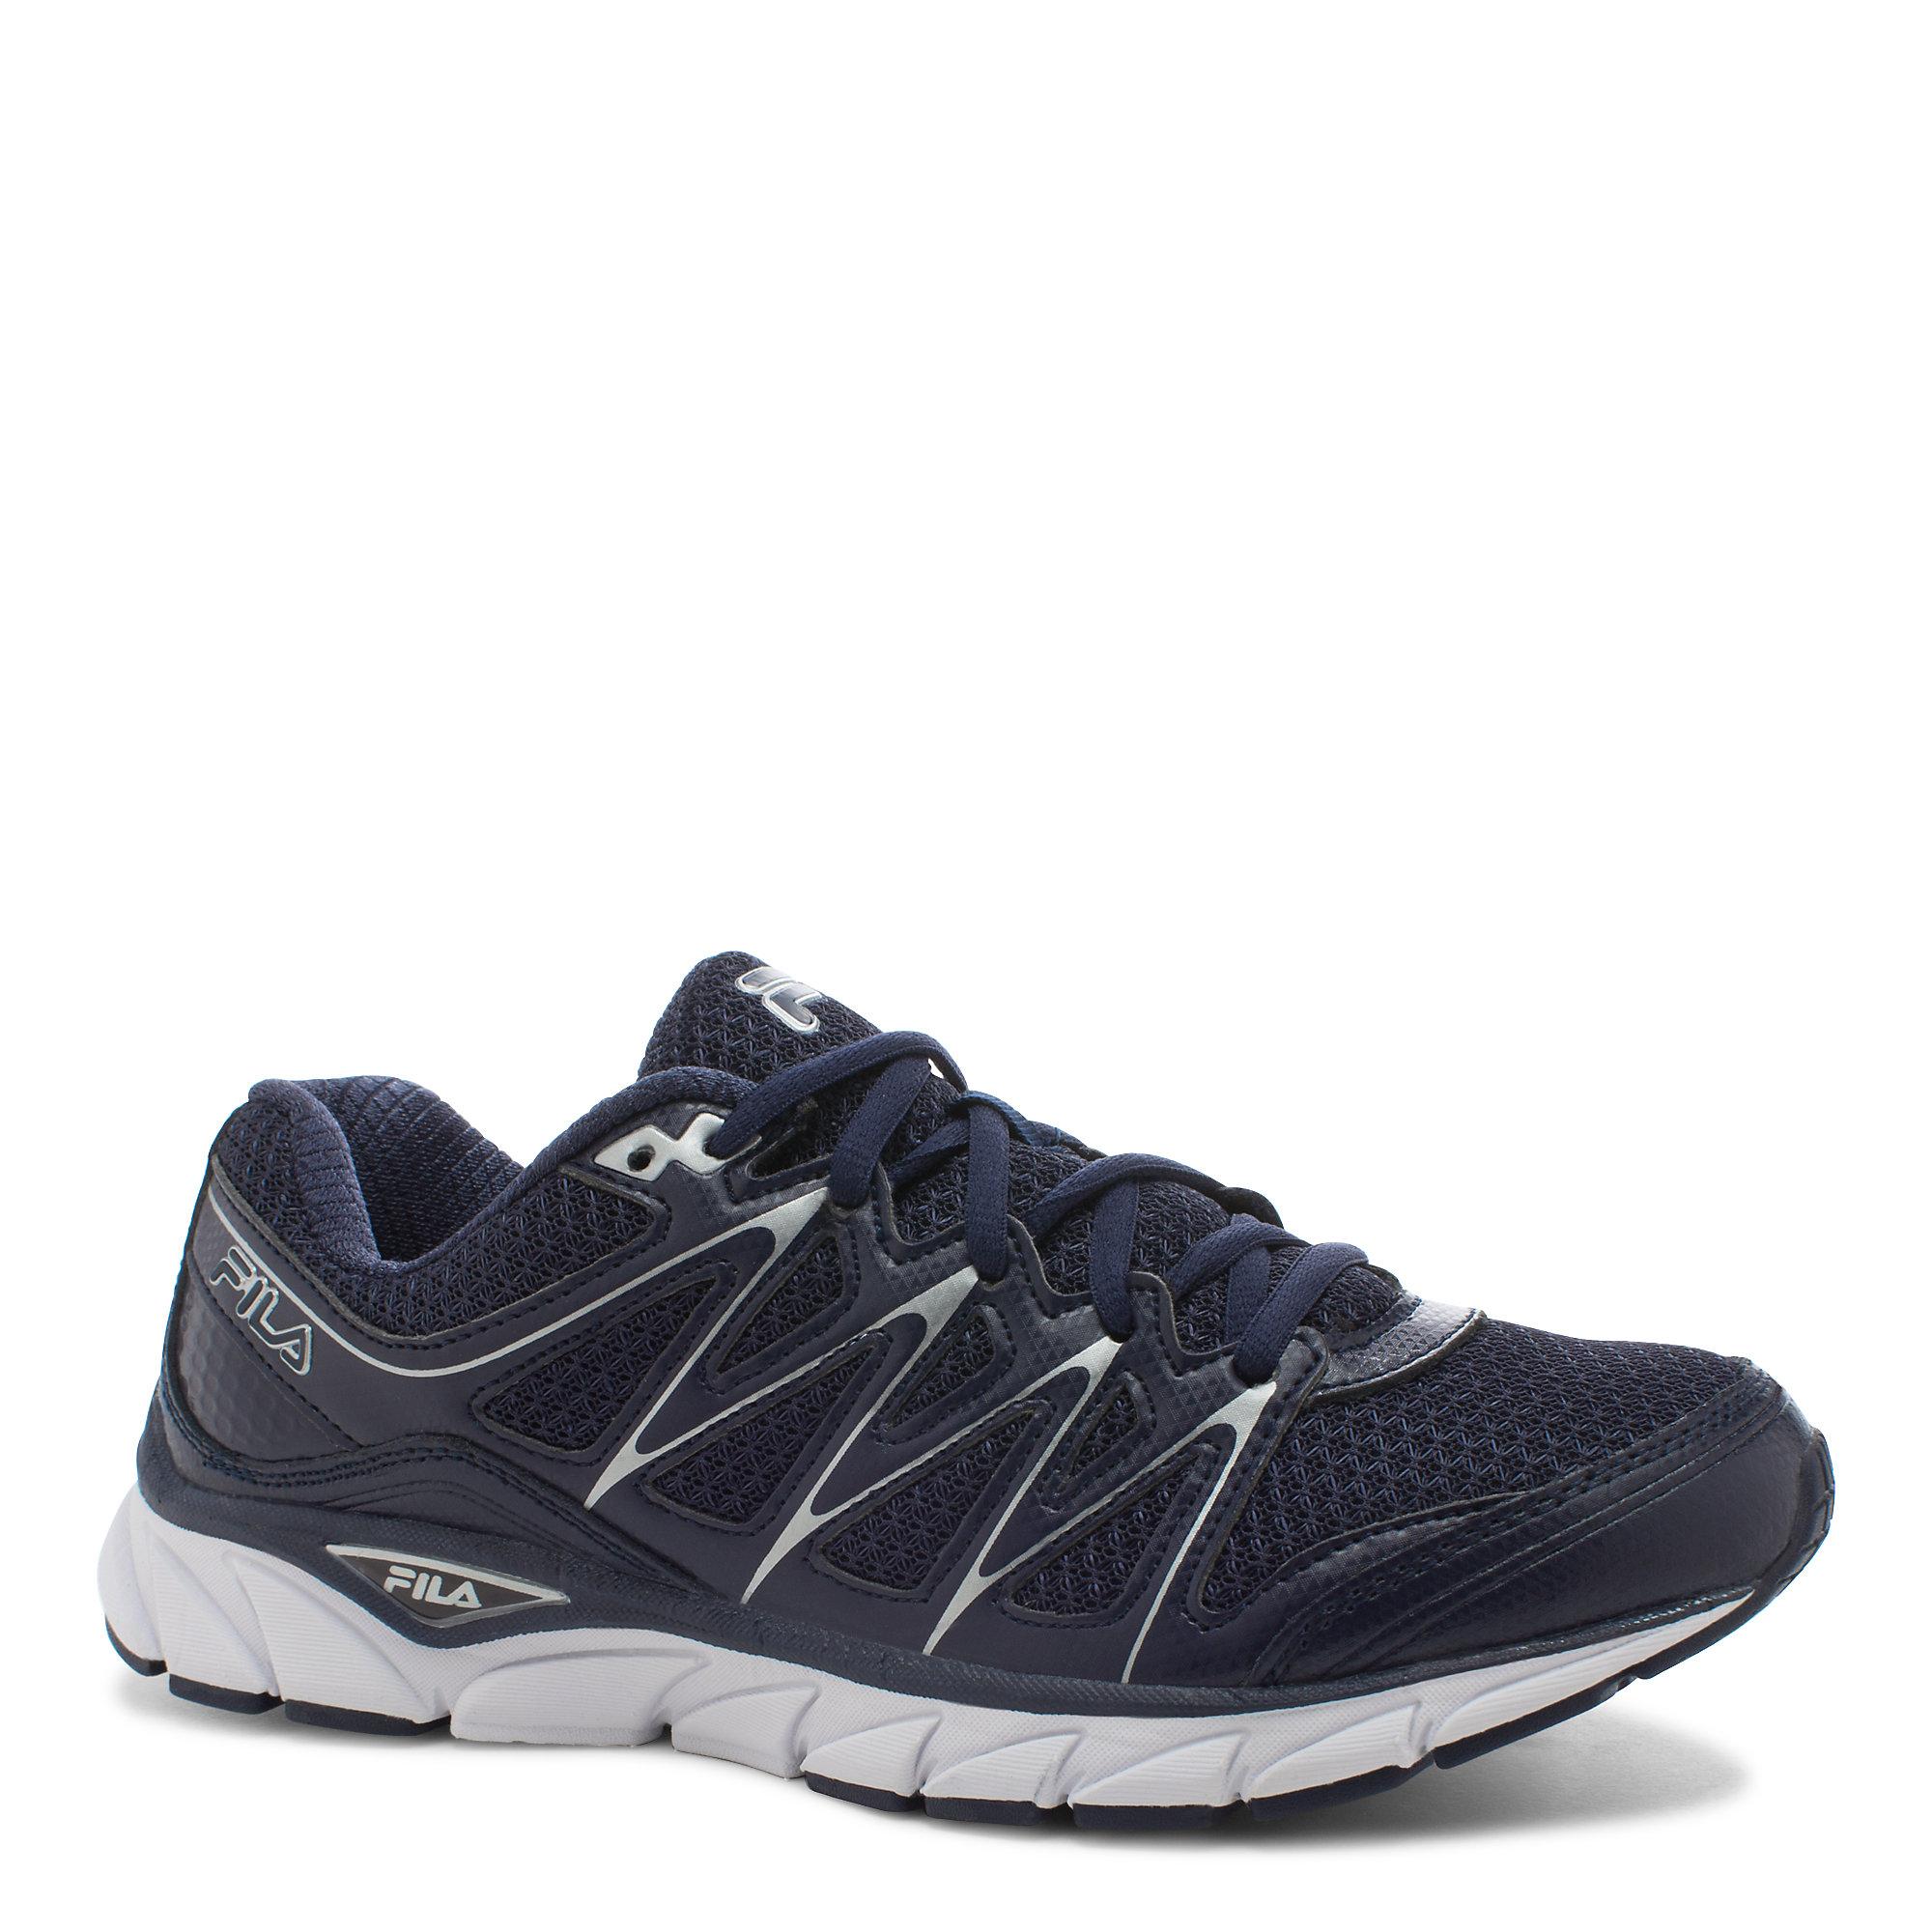 fila s excellarun shoes ebay